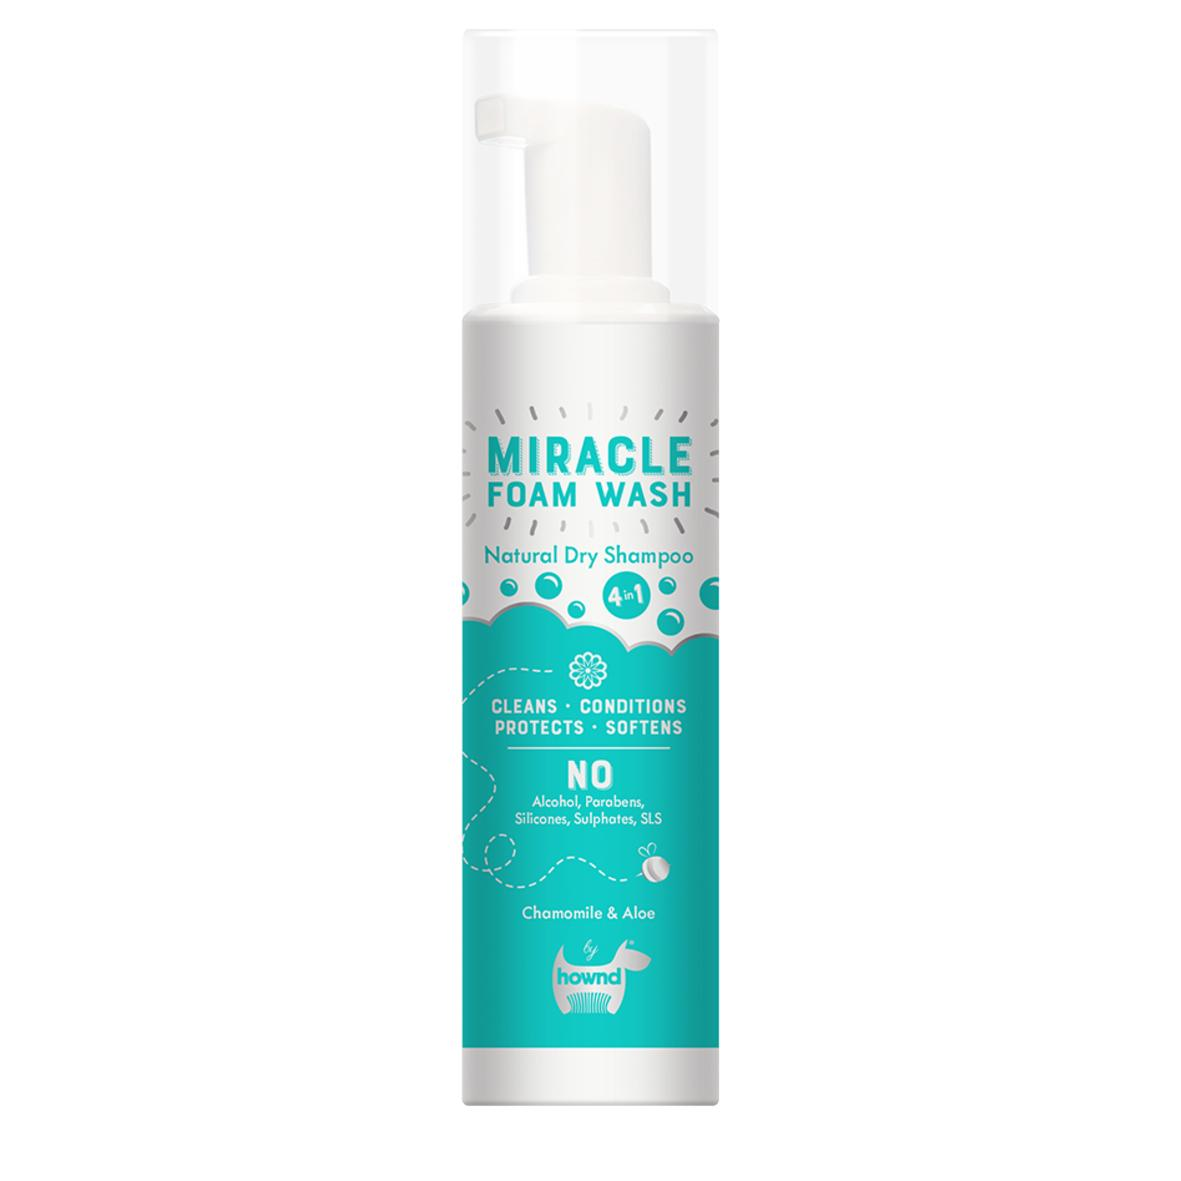 Hownd Miracle Foam Wash 200ml